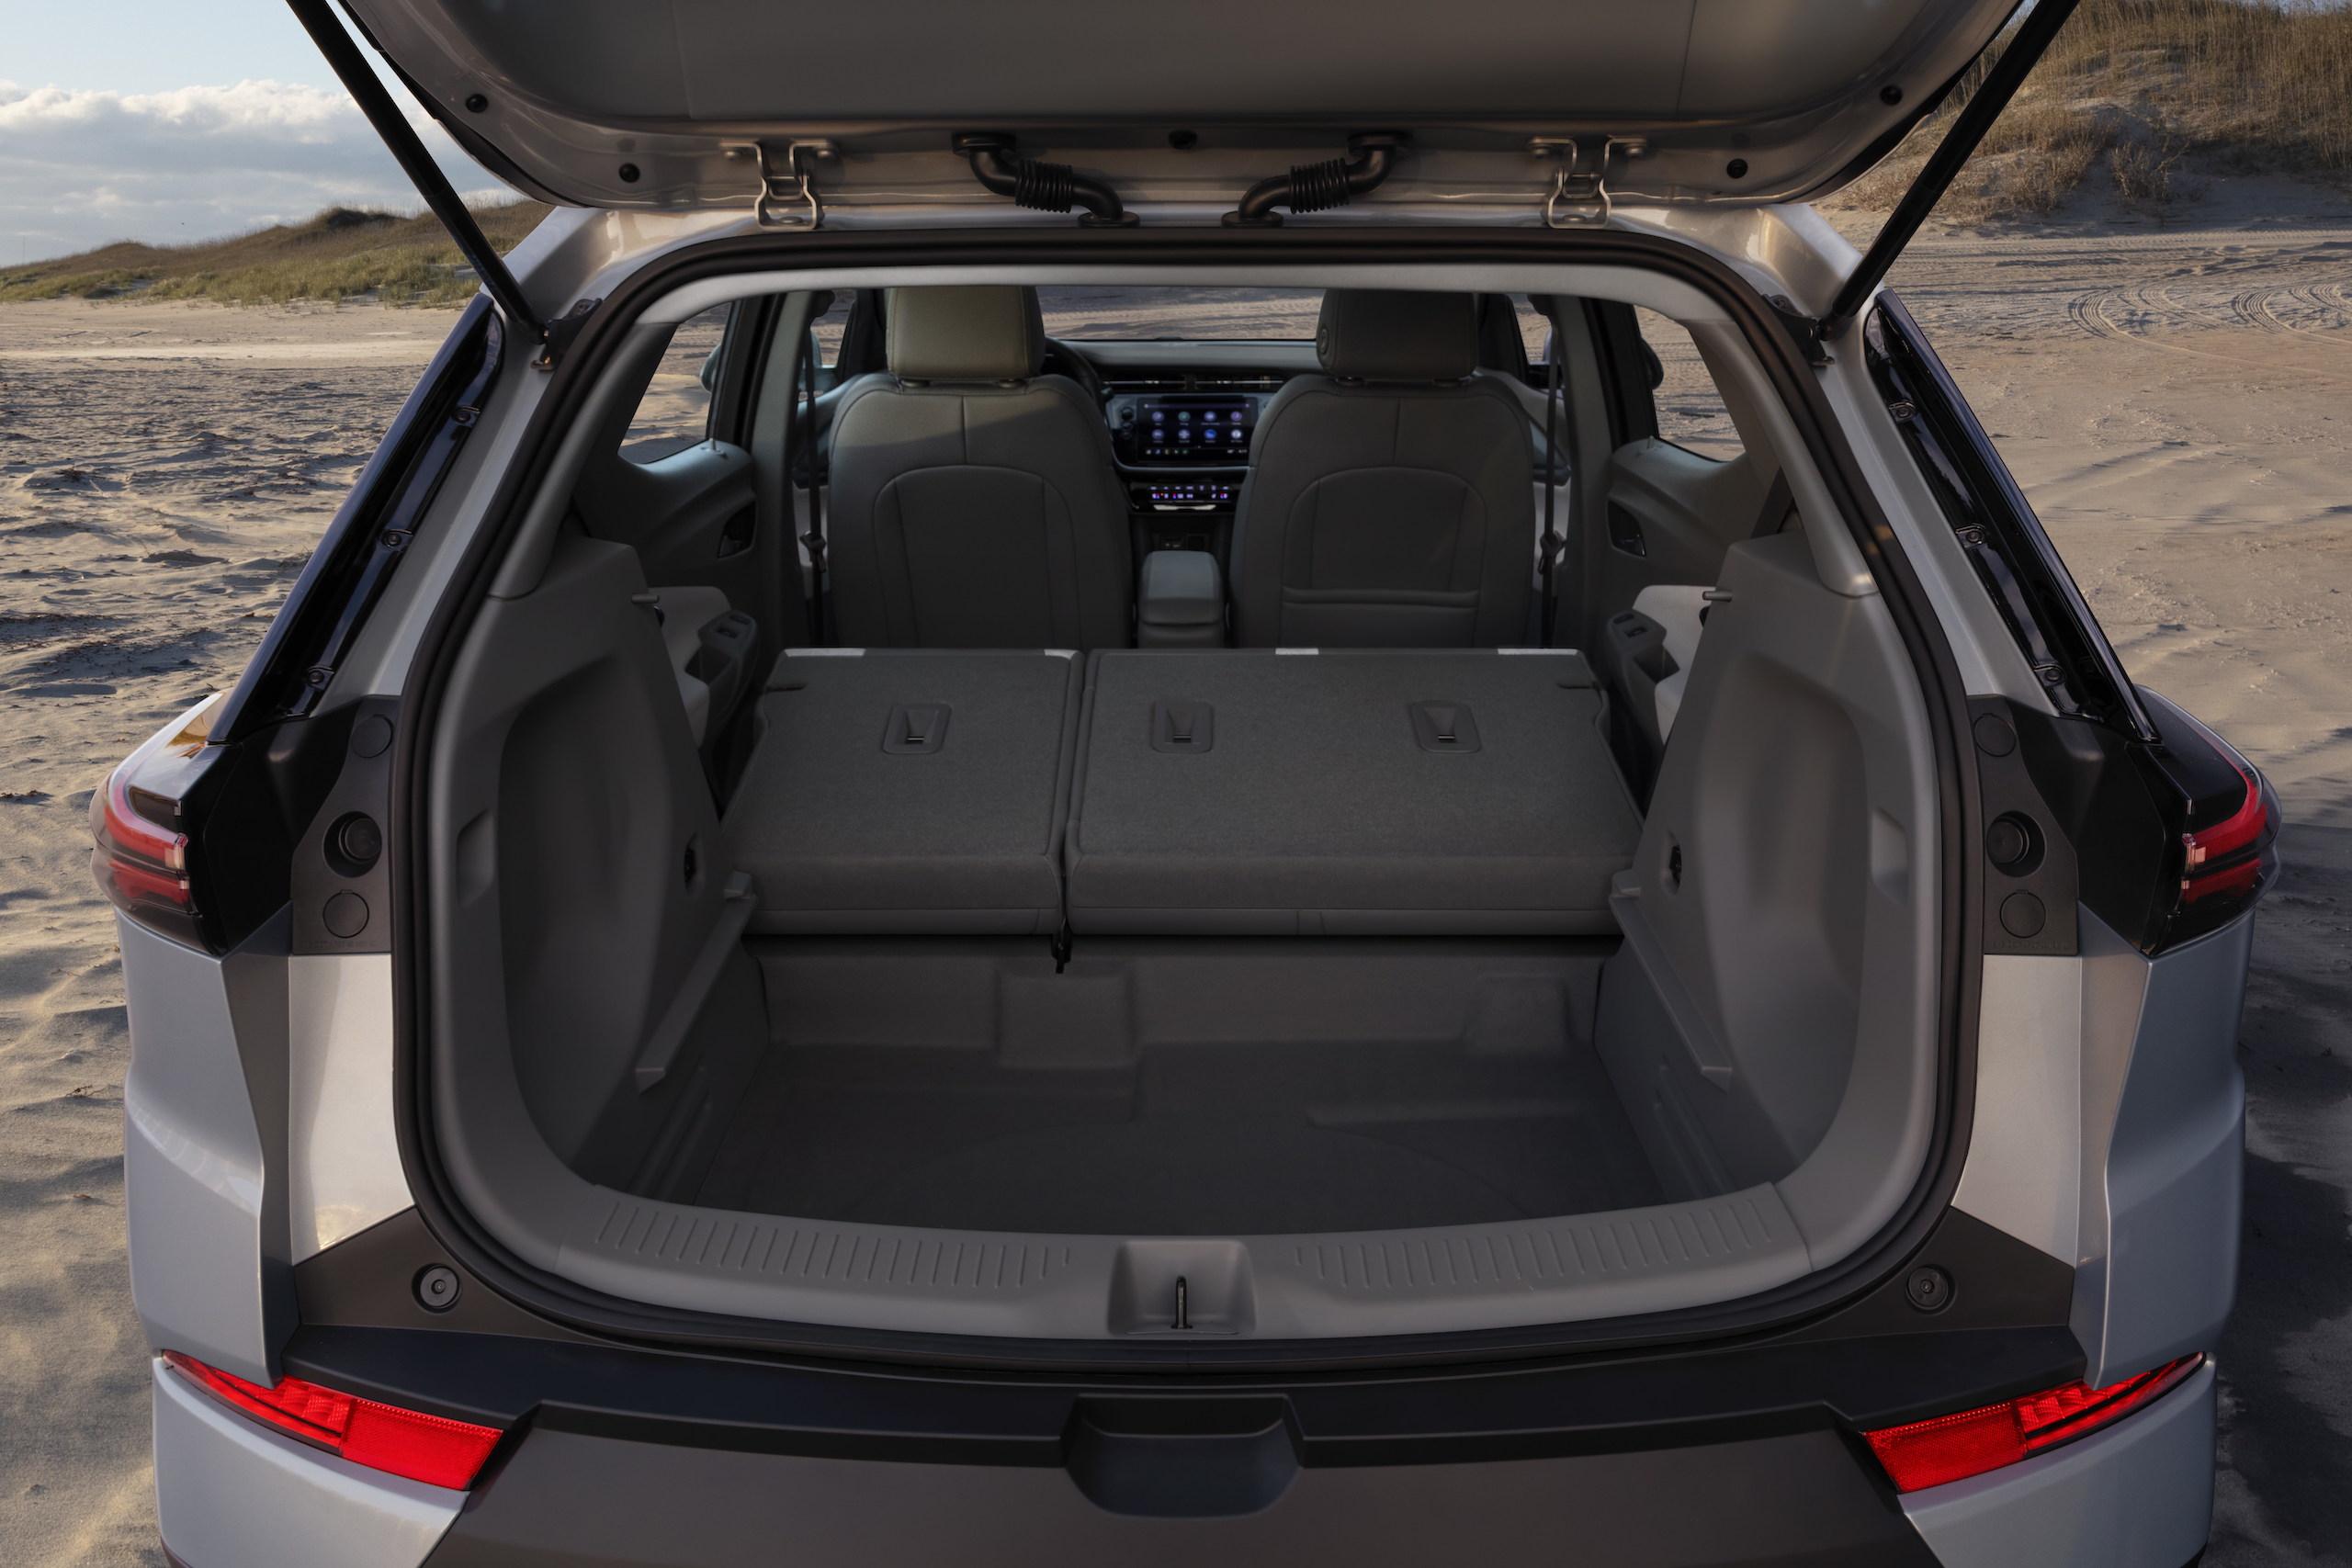 2022 Chevrolet Bolt EUV rear cargo seats folded tray removed